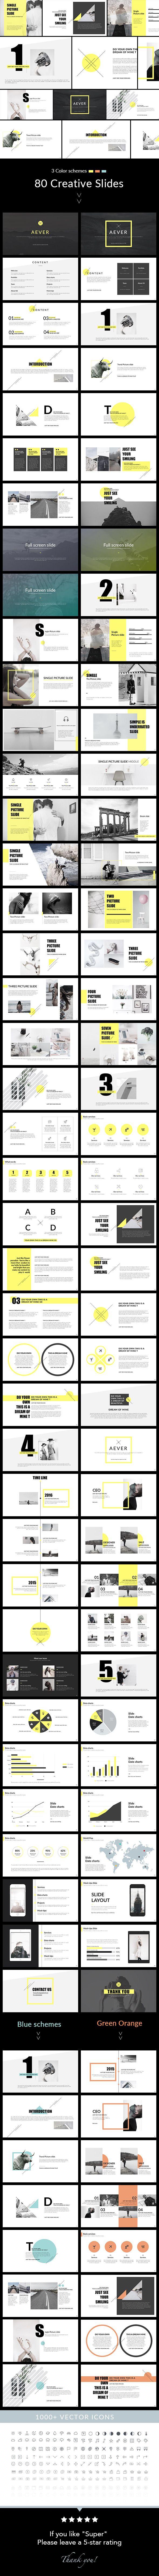 AEVER PowerPoint Presentation Template Creative PowerPoint